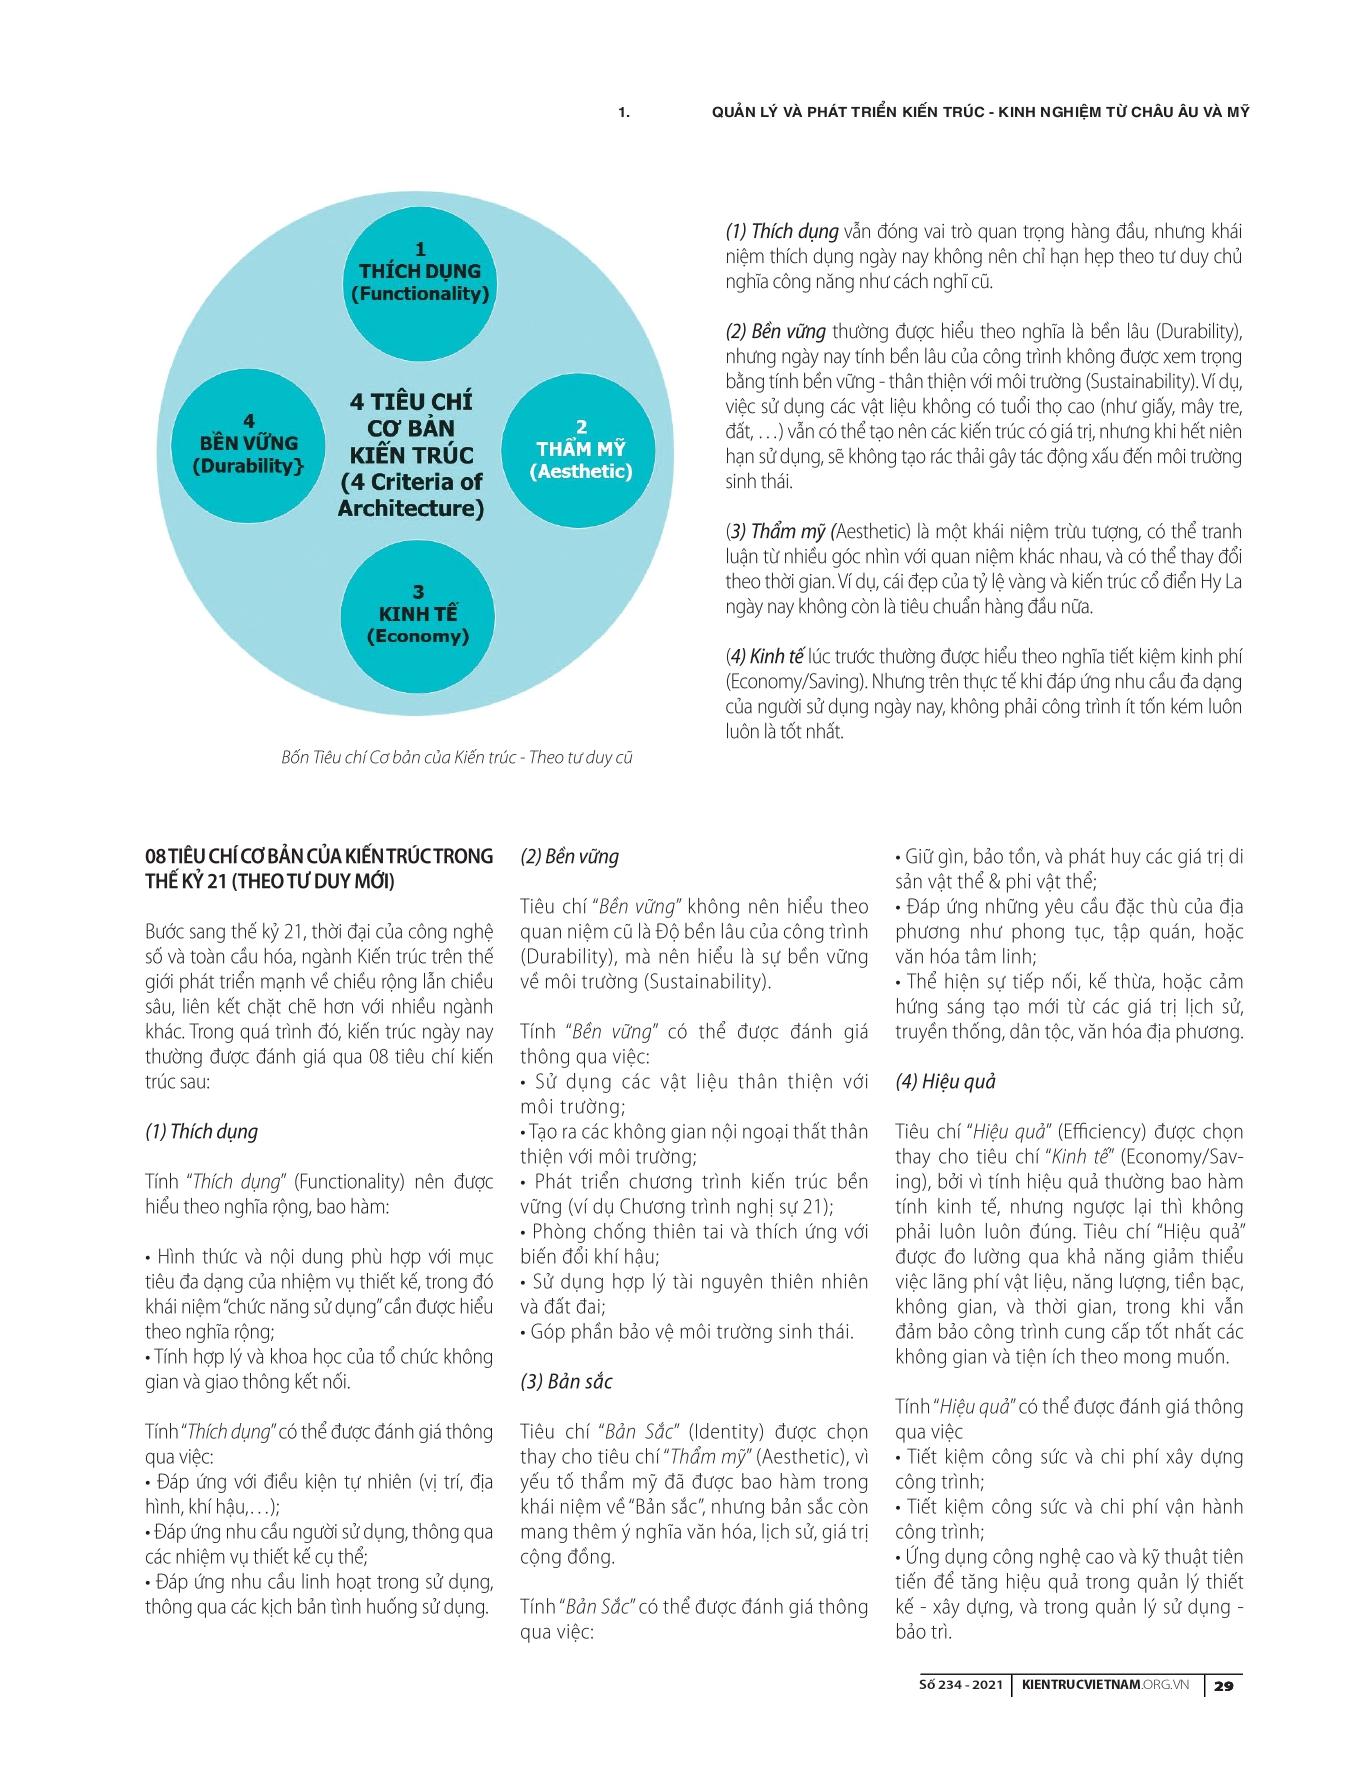 TCKTVN 234 P1_page-0029